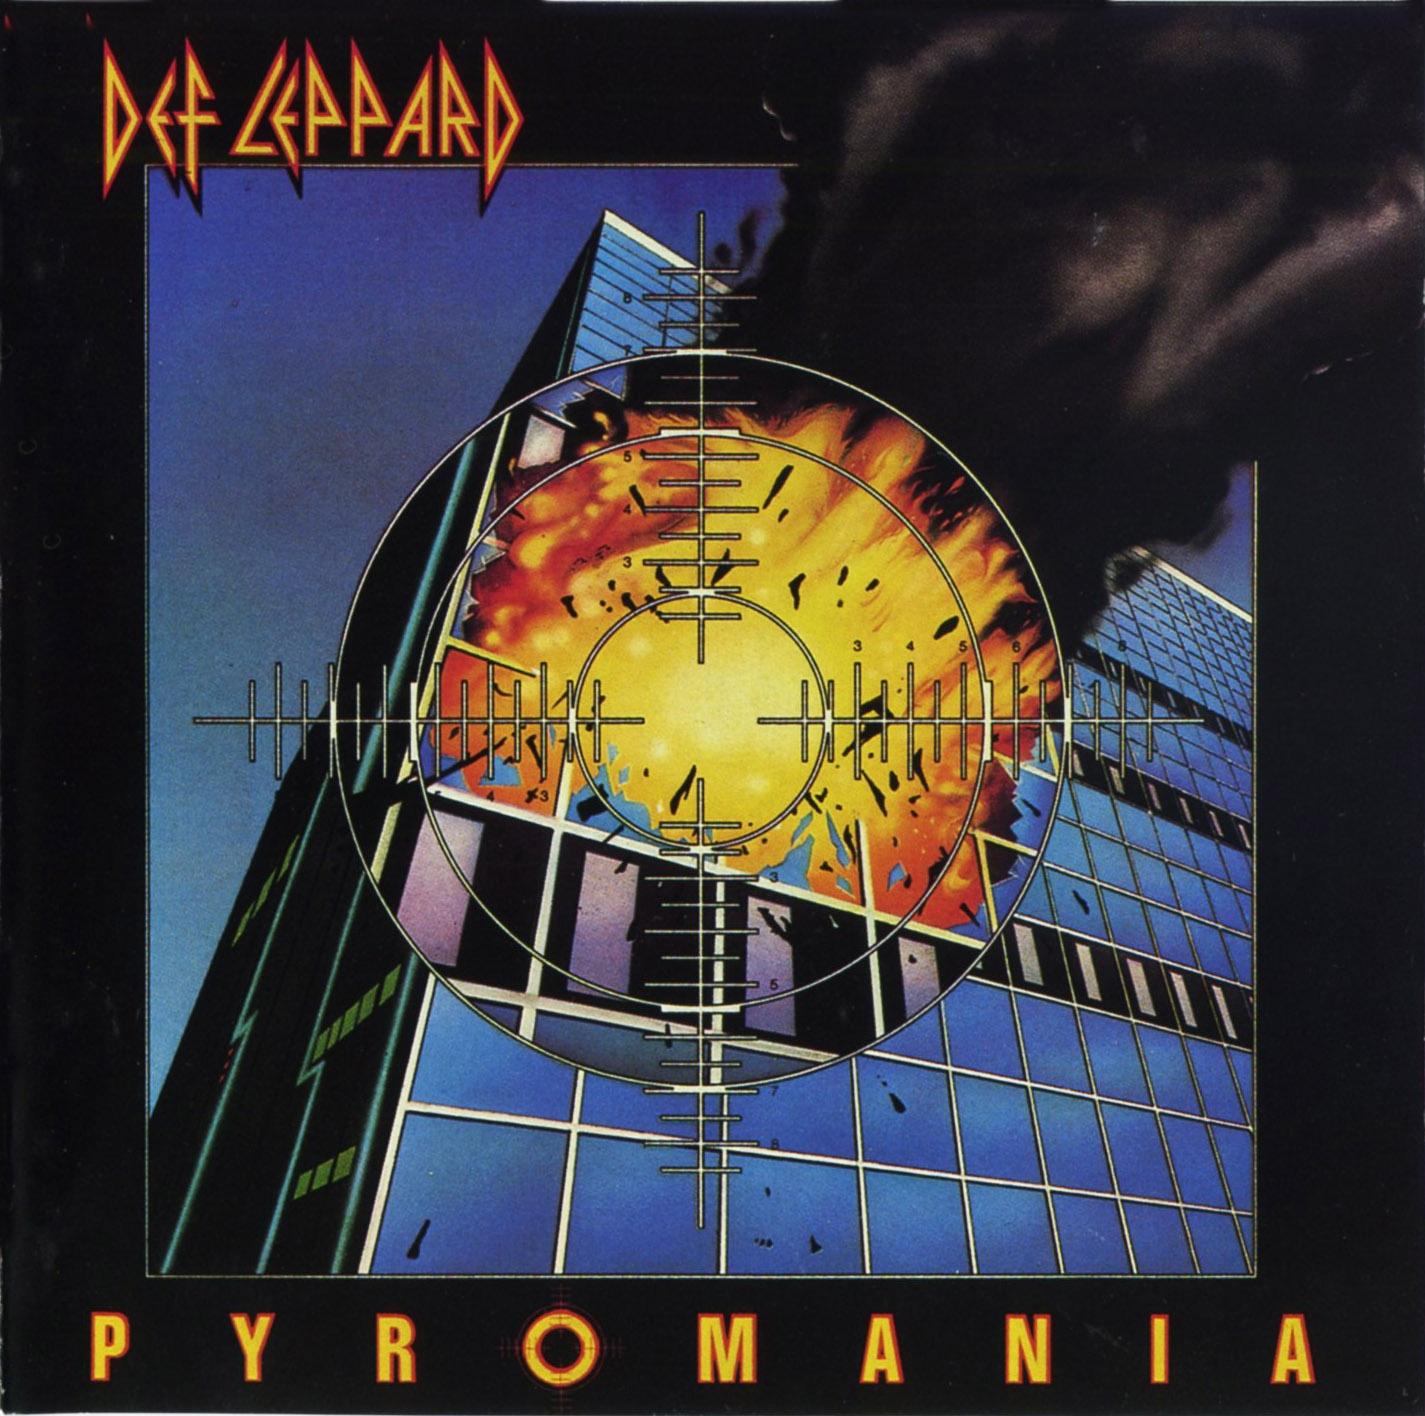 pyromania 1983